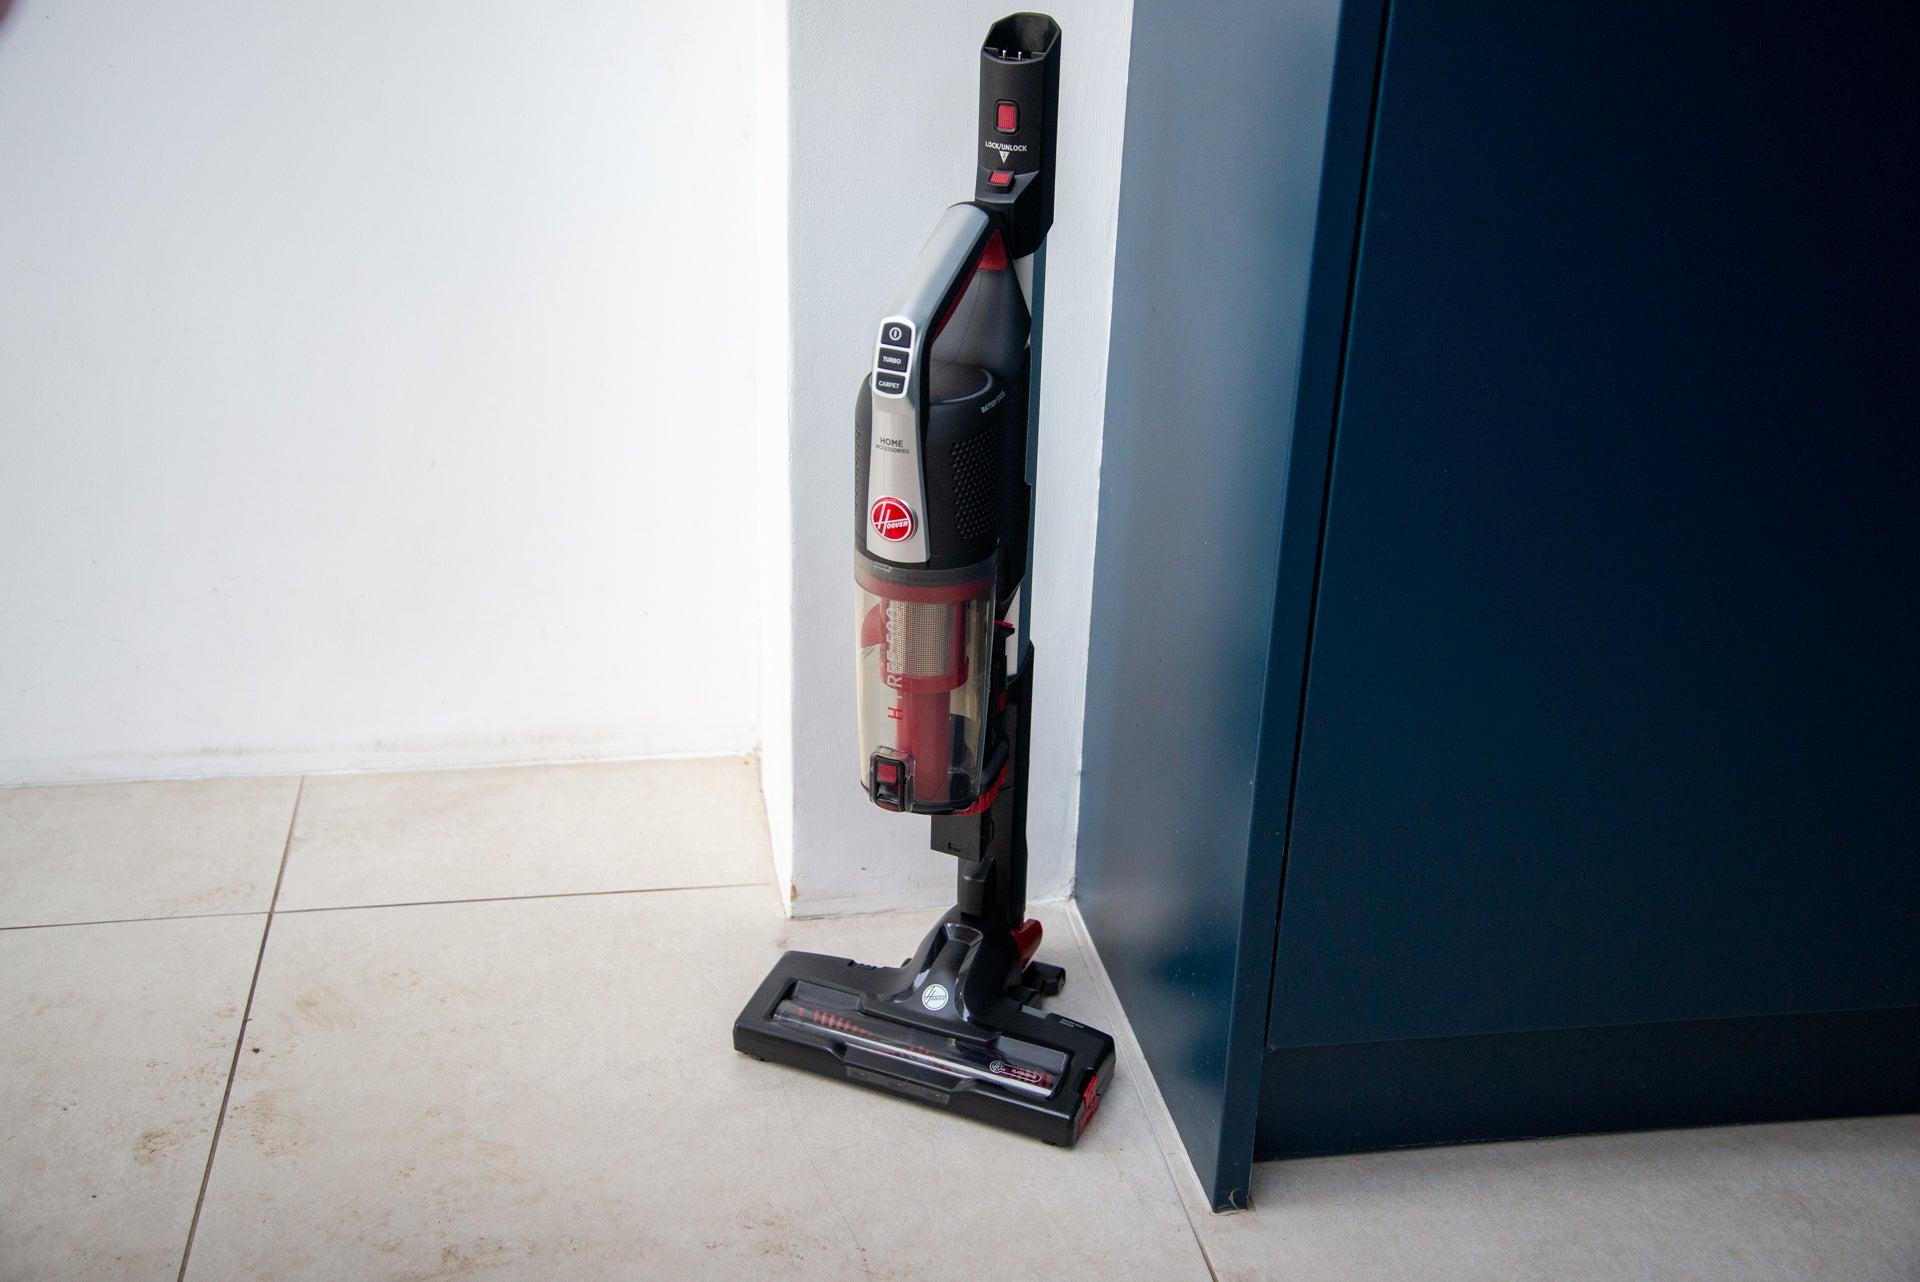 Ninja Health Grill & Air Fryer AG301UK small storage